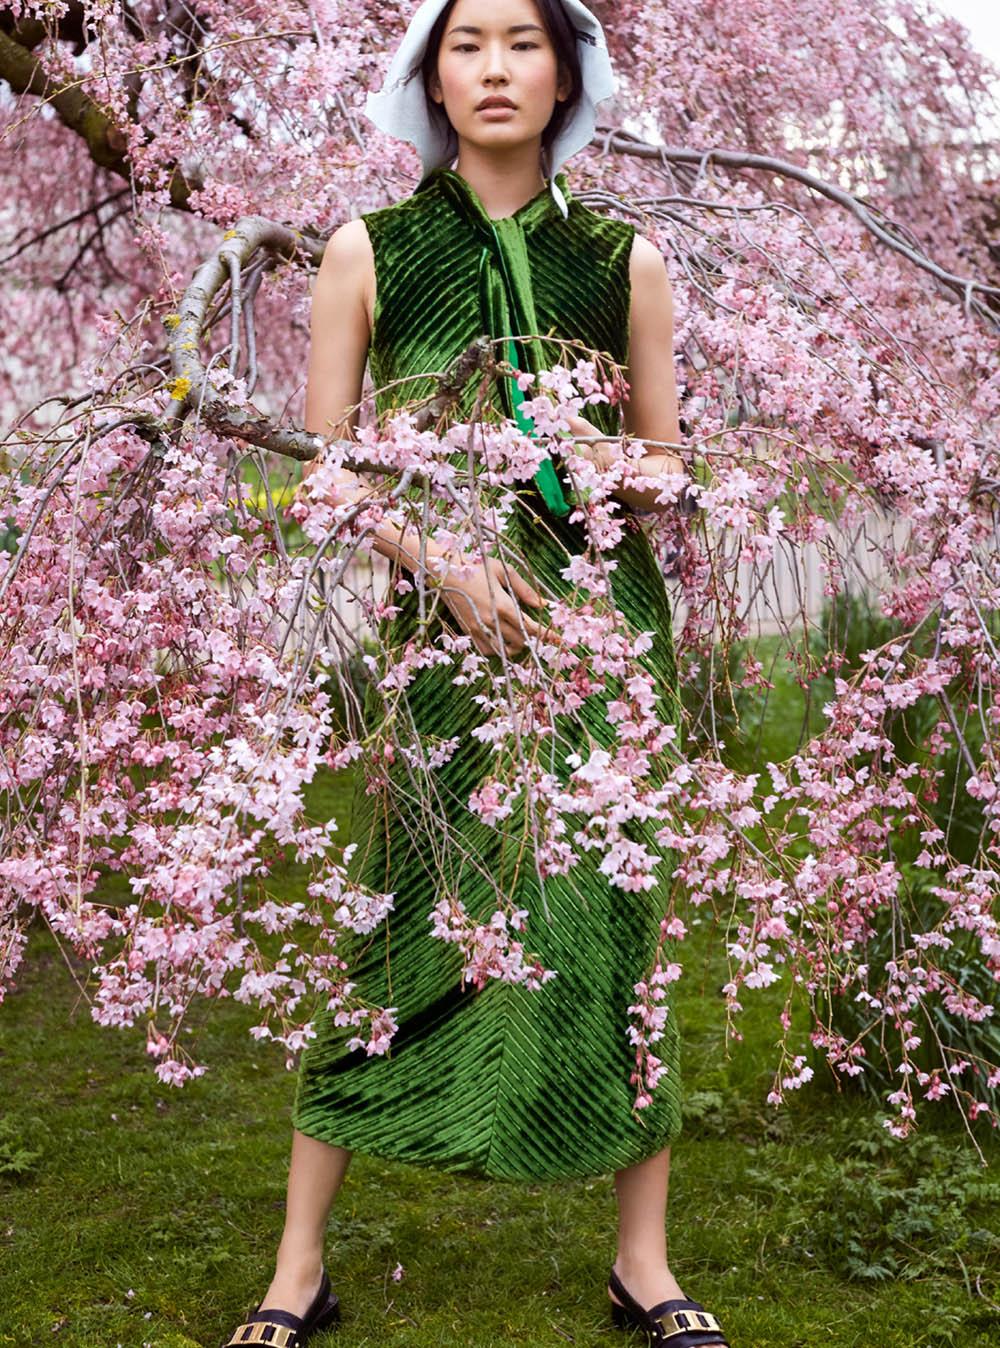 Hyunjoo Hwang and Melody Lulu-Briggs by Agata Pospieszynska for Harper's Bazaar UK June 2020